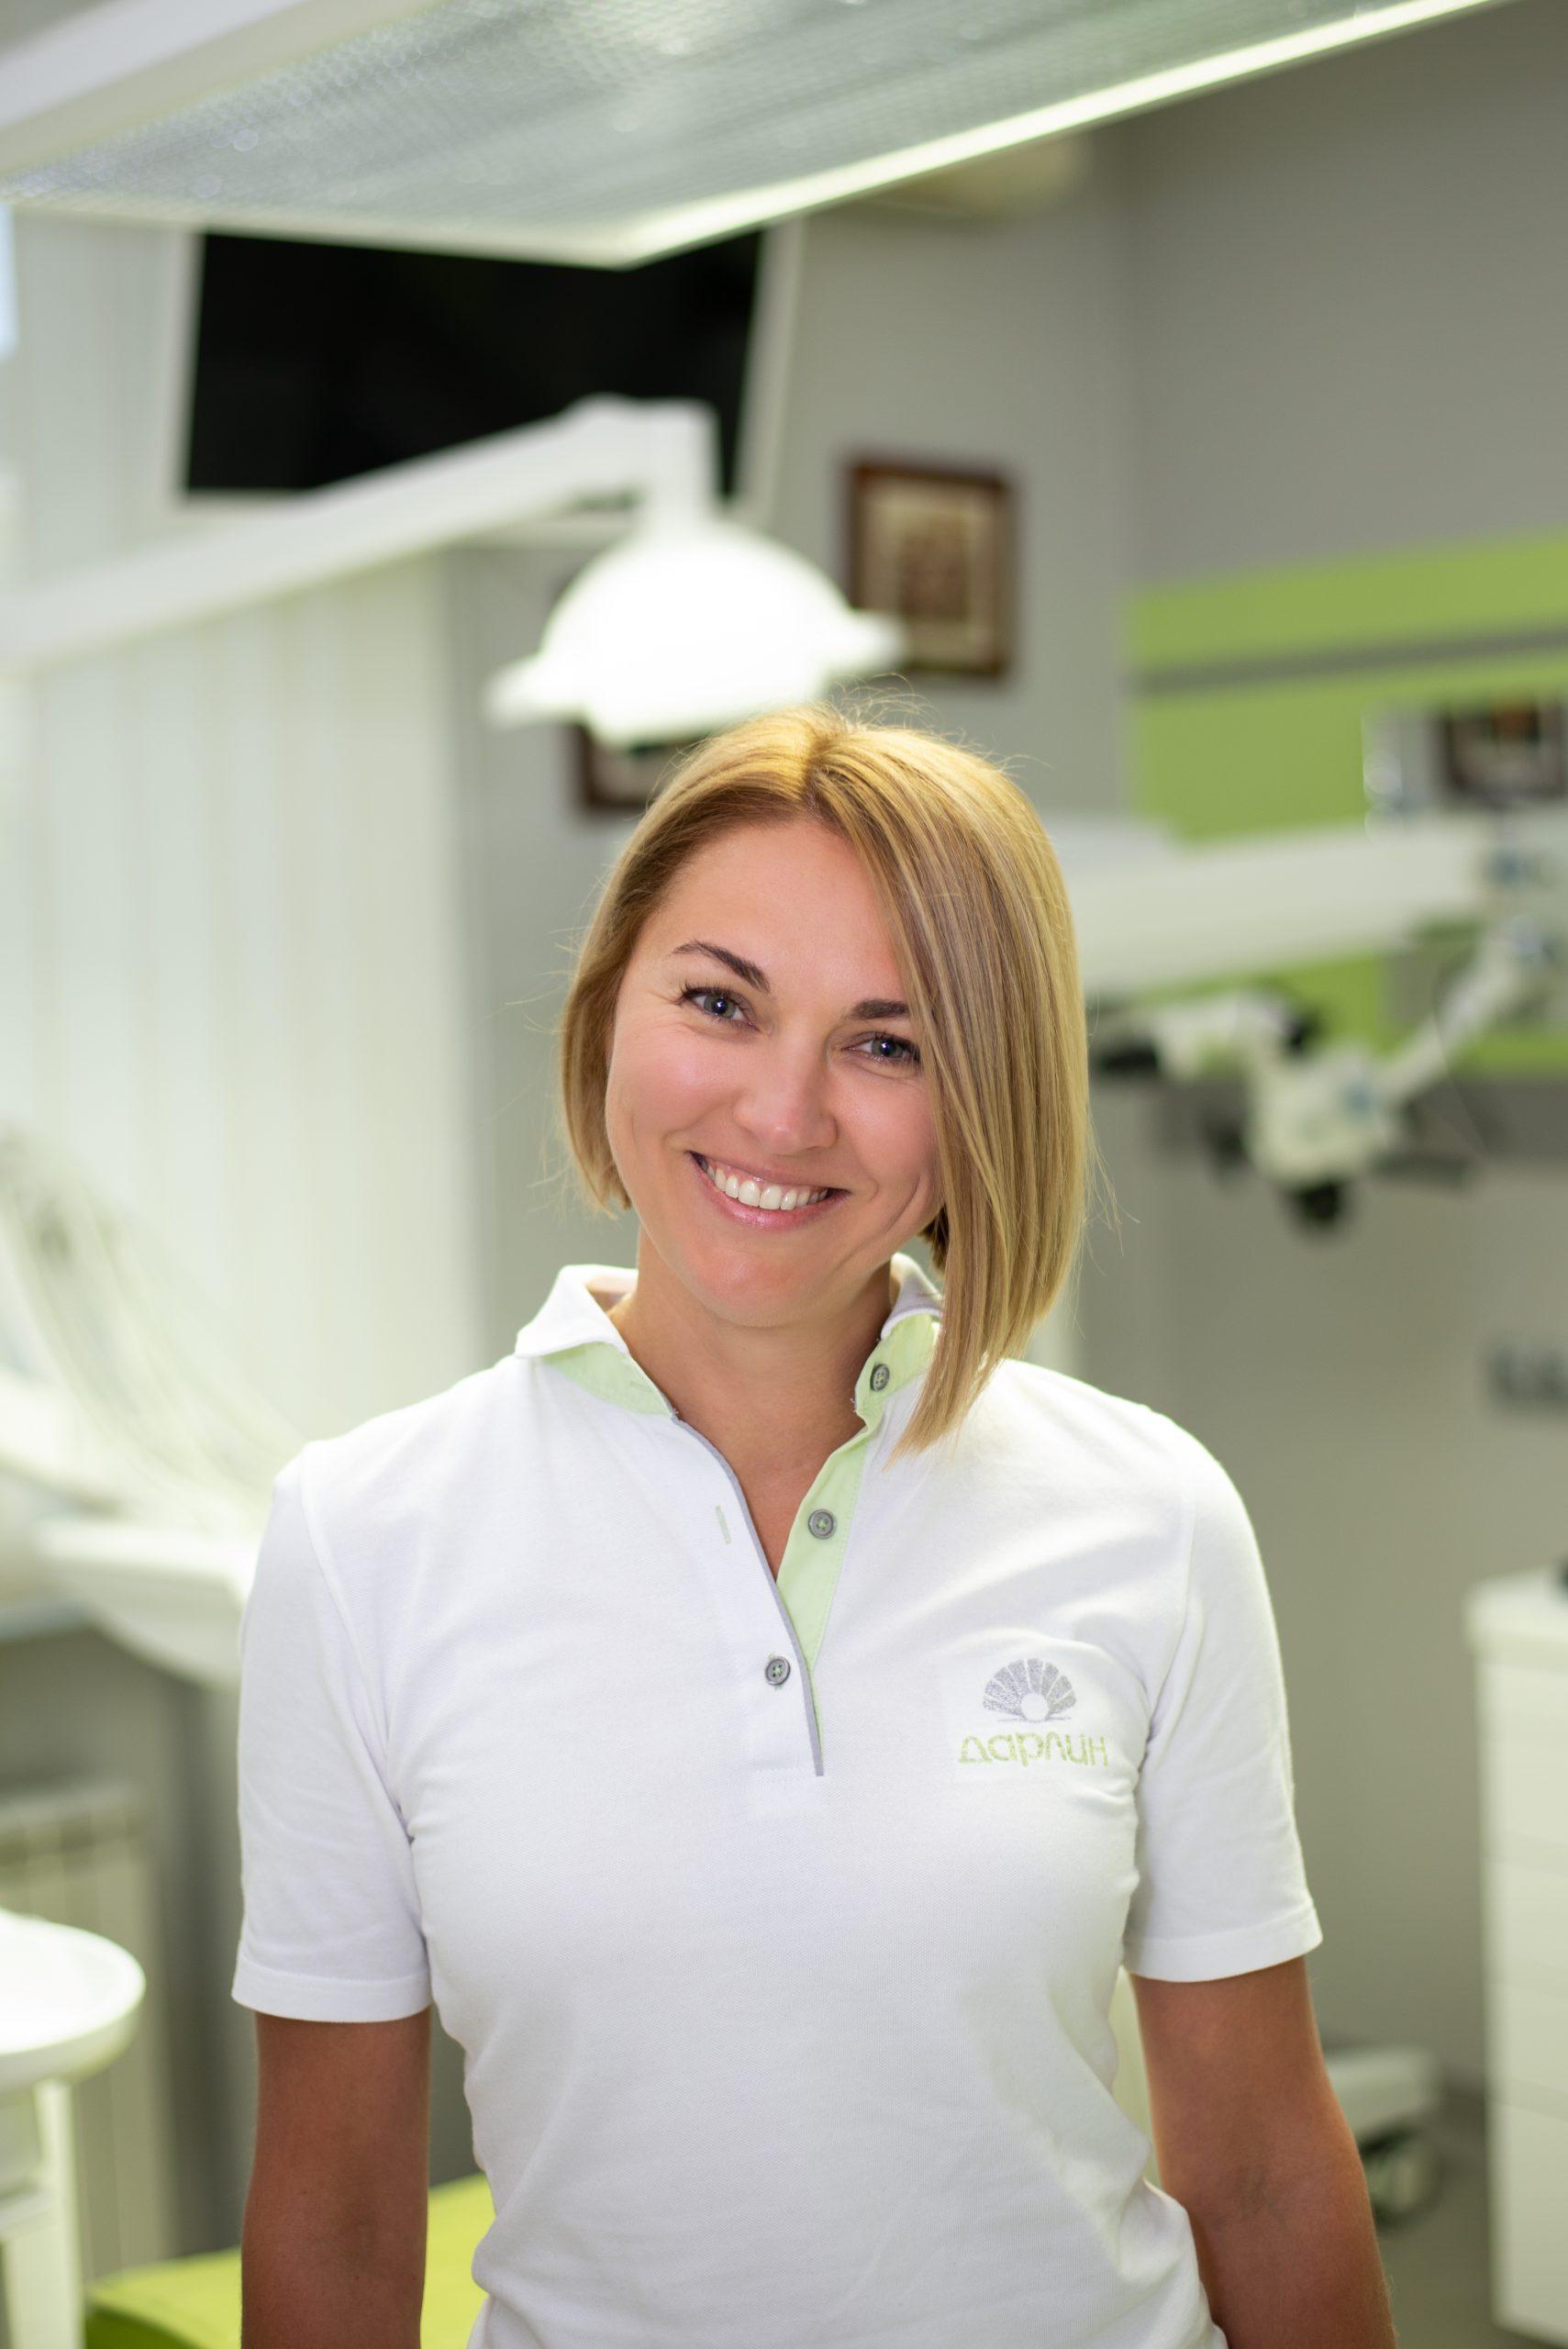 Даниловская Оксана Юрьевна